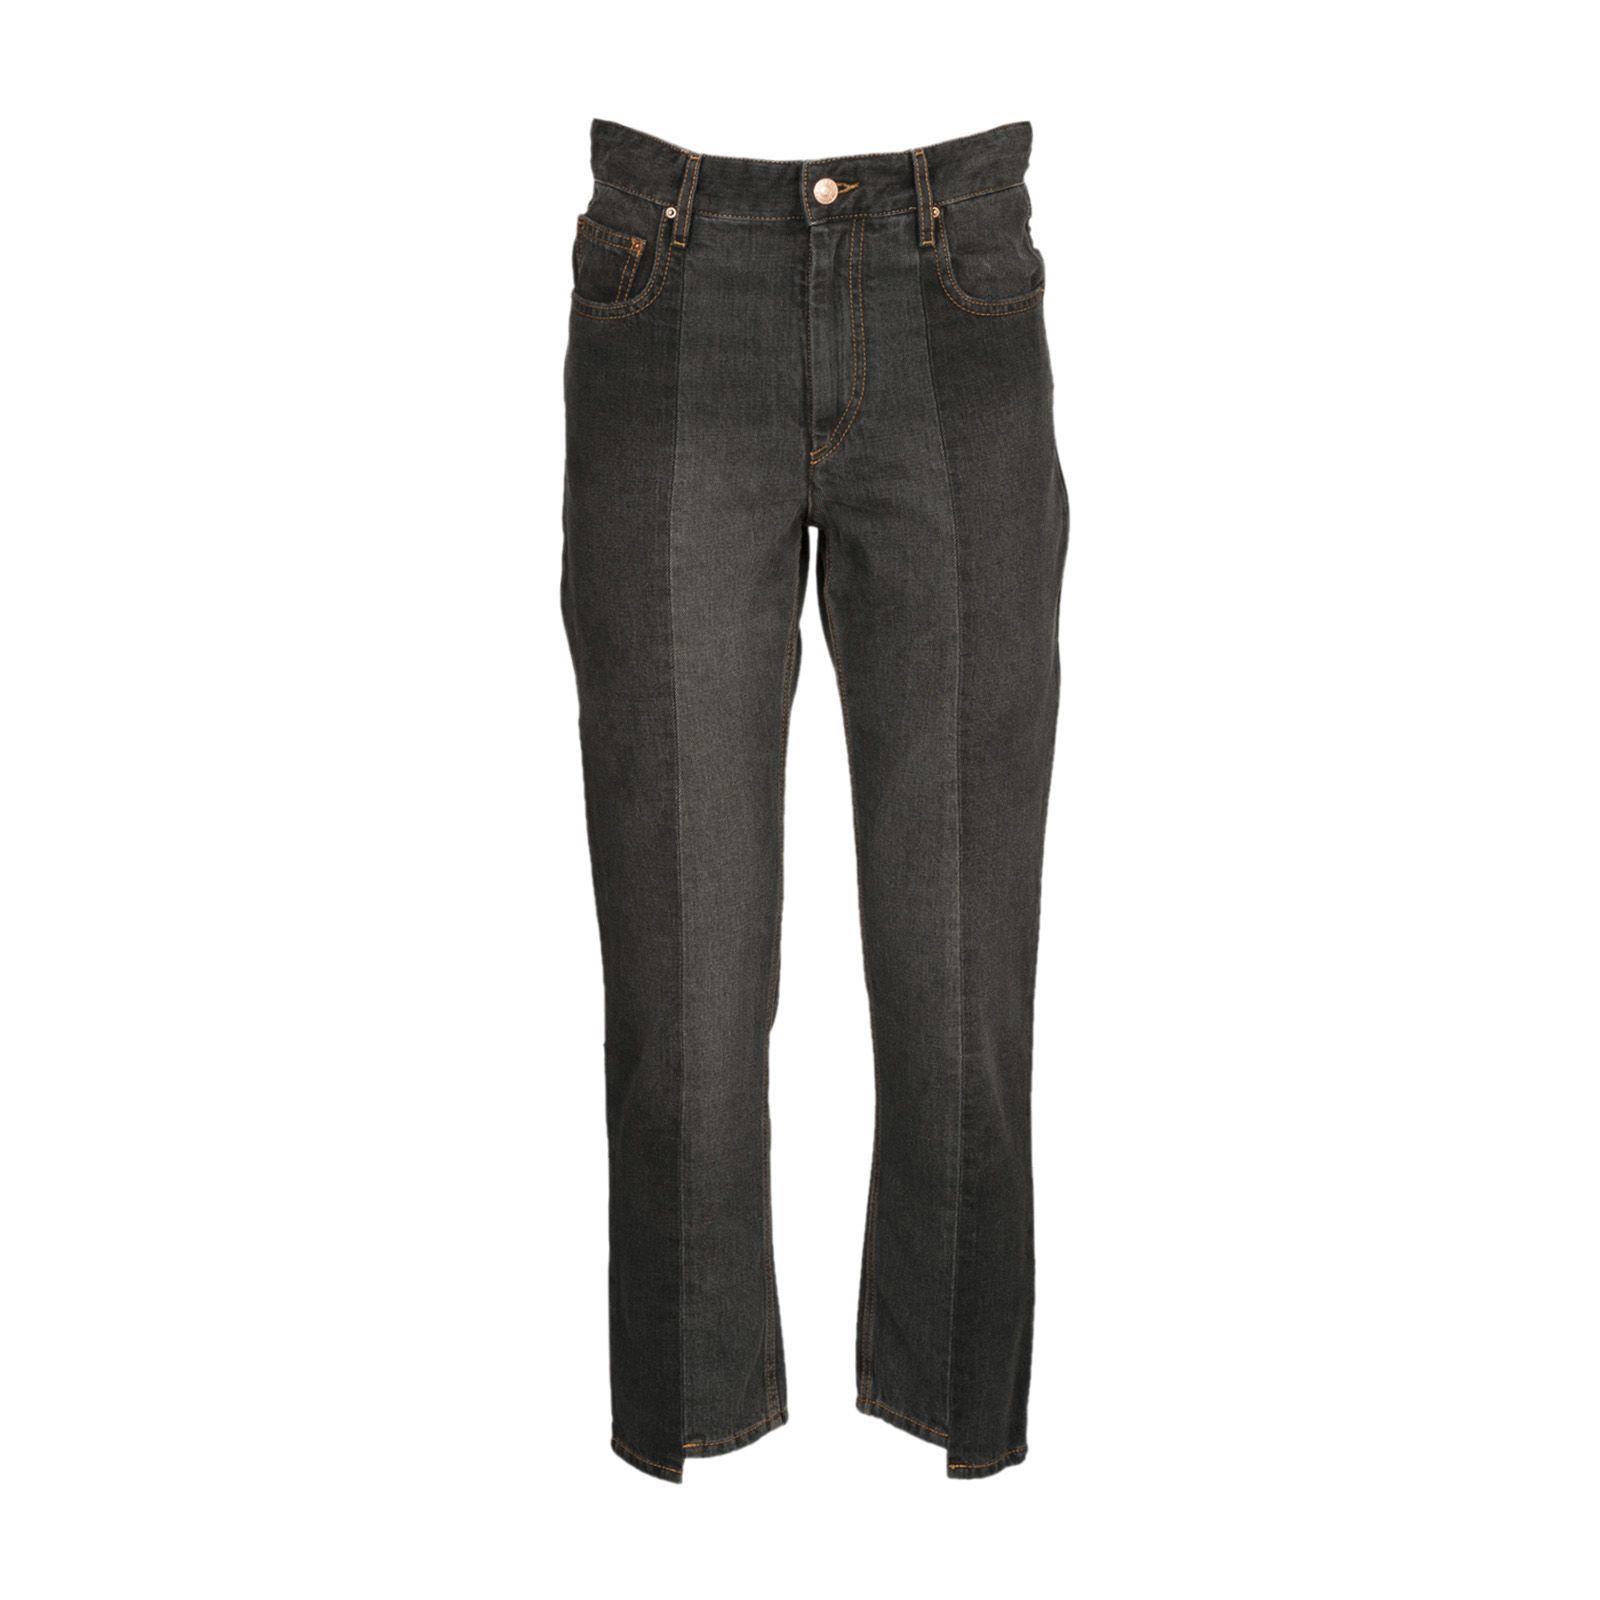 Isabel Marant Etoile Clancy Jeans